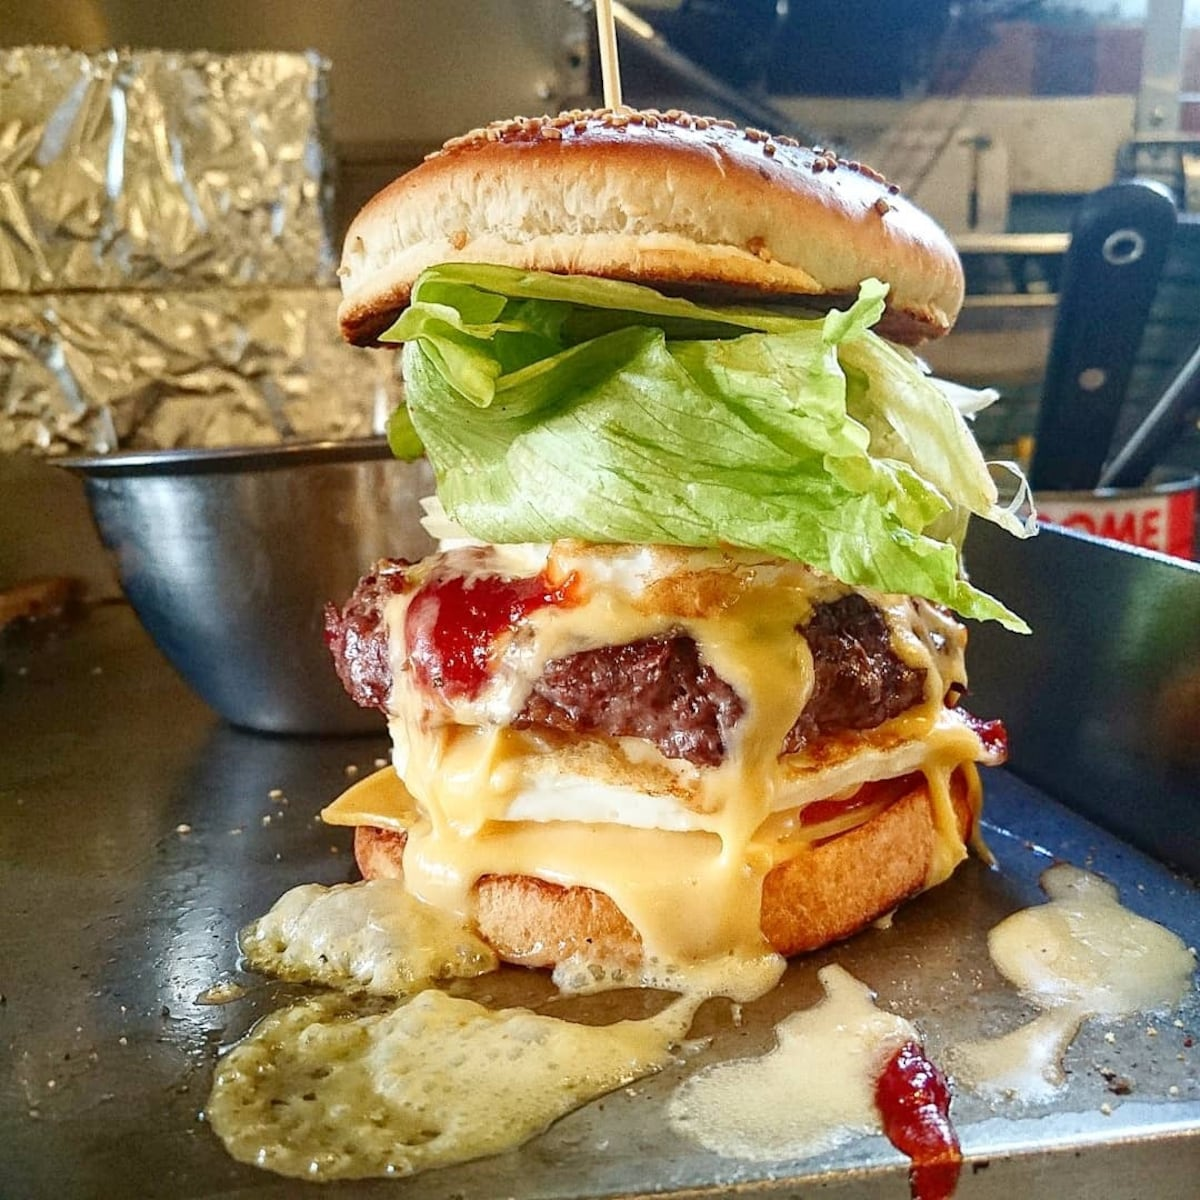 「BAKER BOUNCE」爆漿多汁的自家製手工漢堡